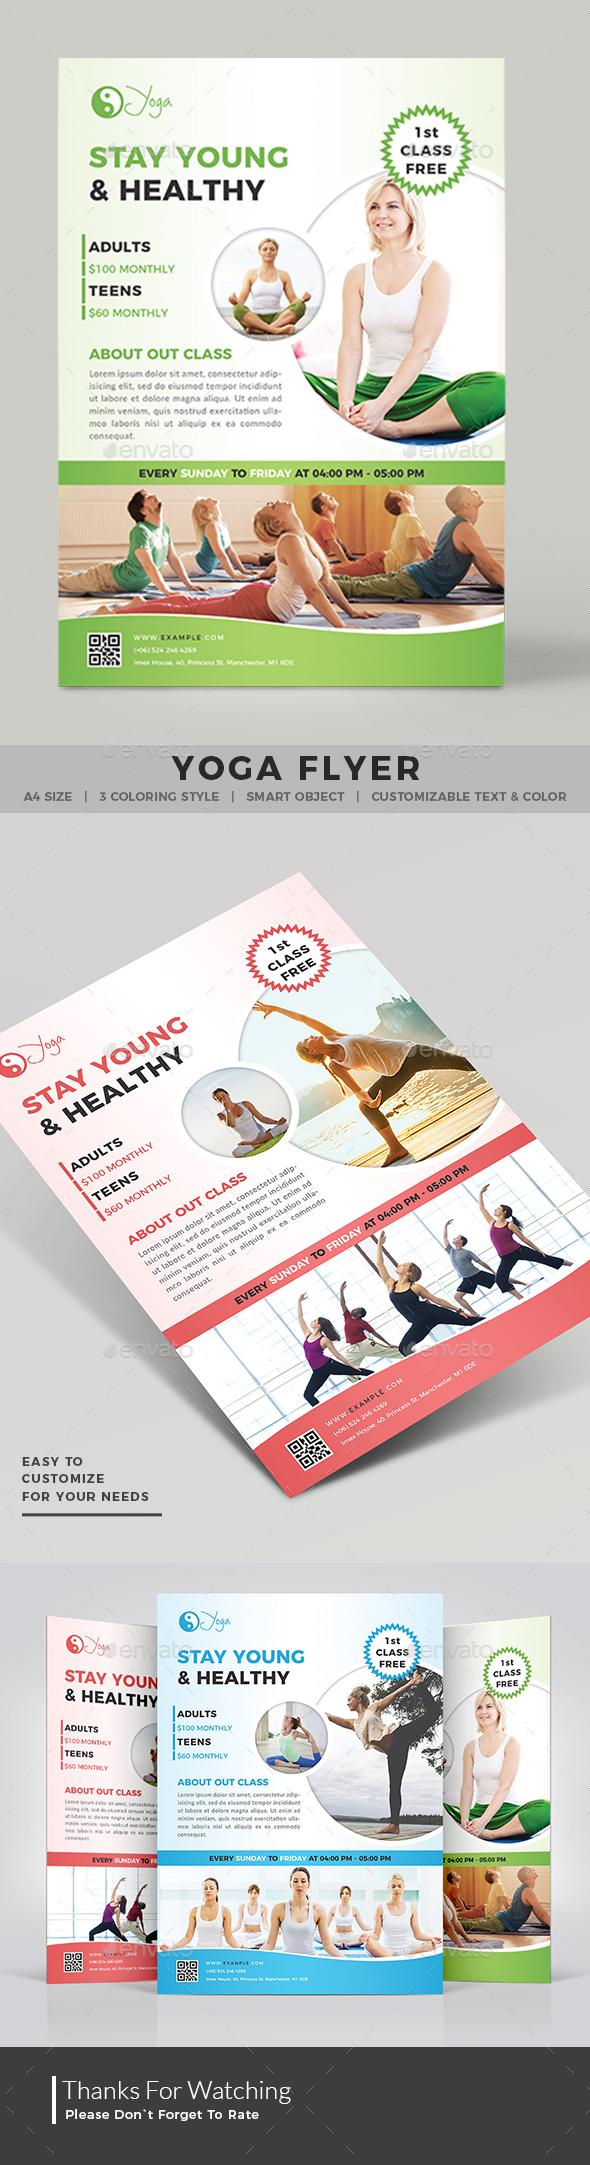 Yoga Flyer - Commerce Flyers